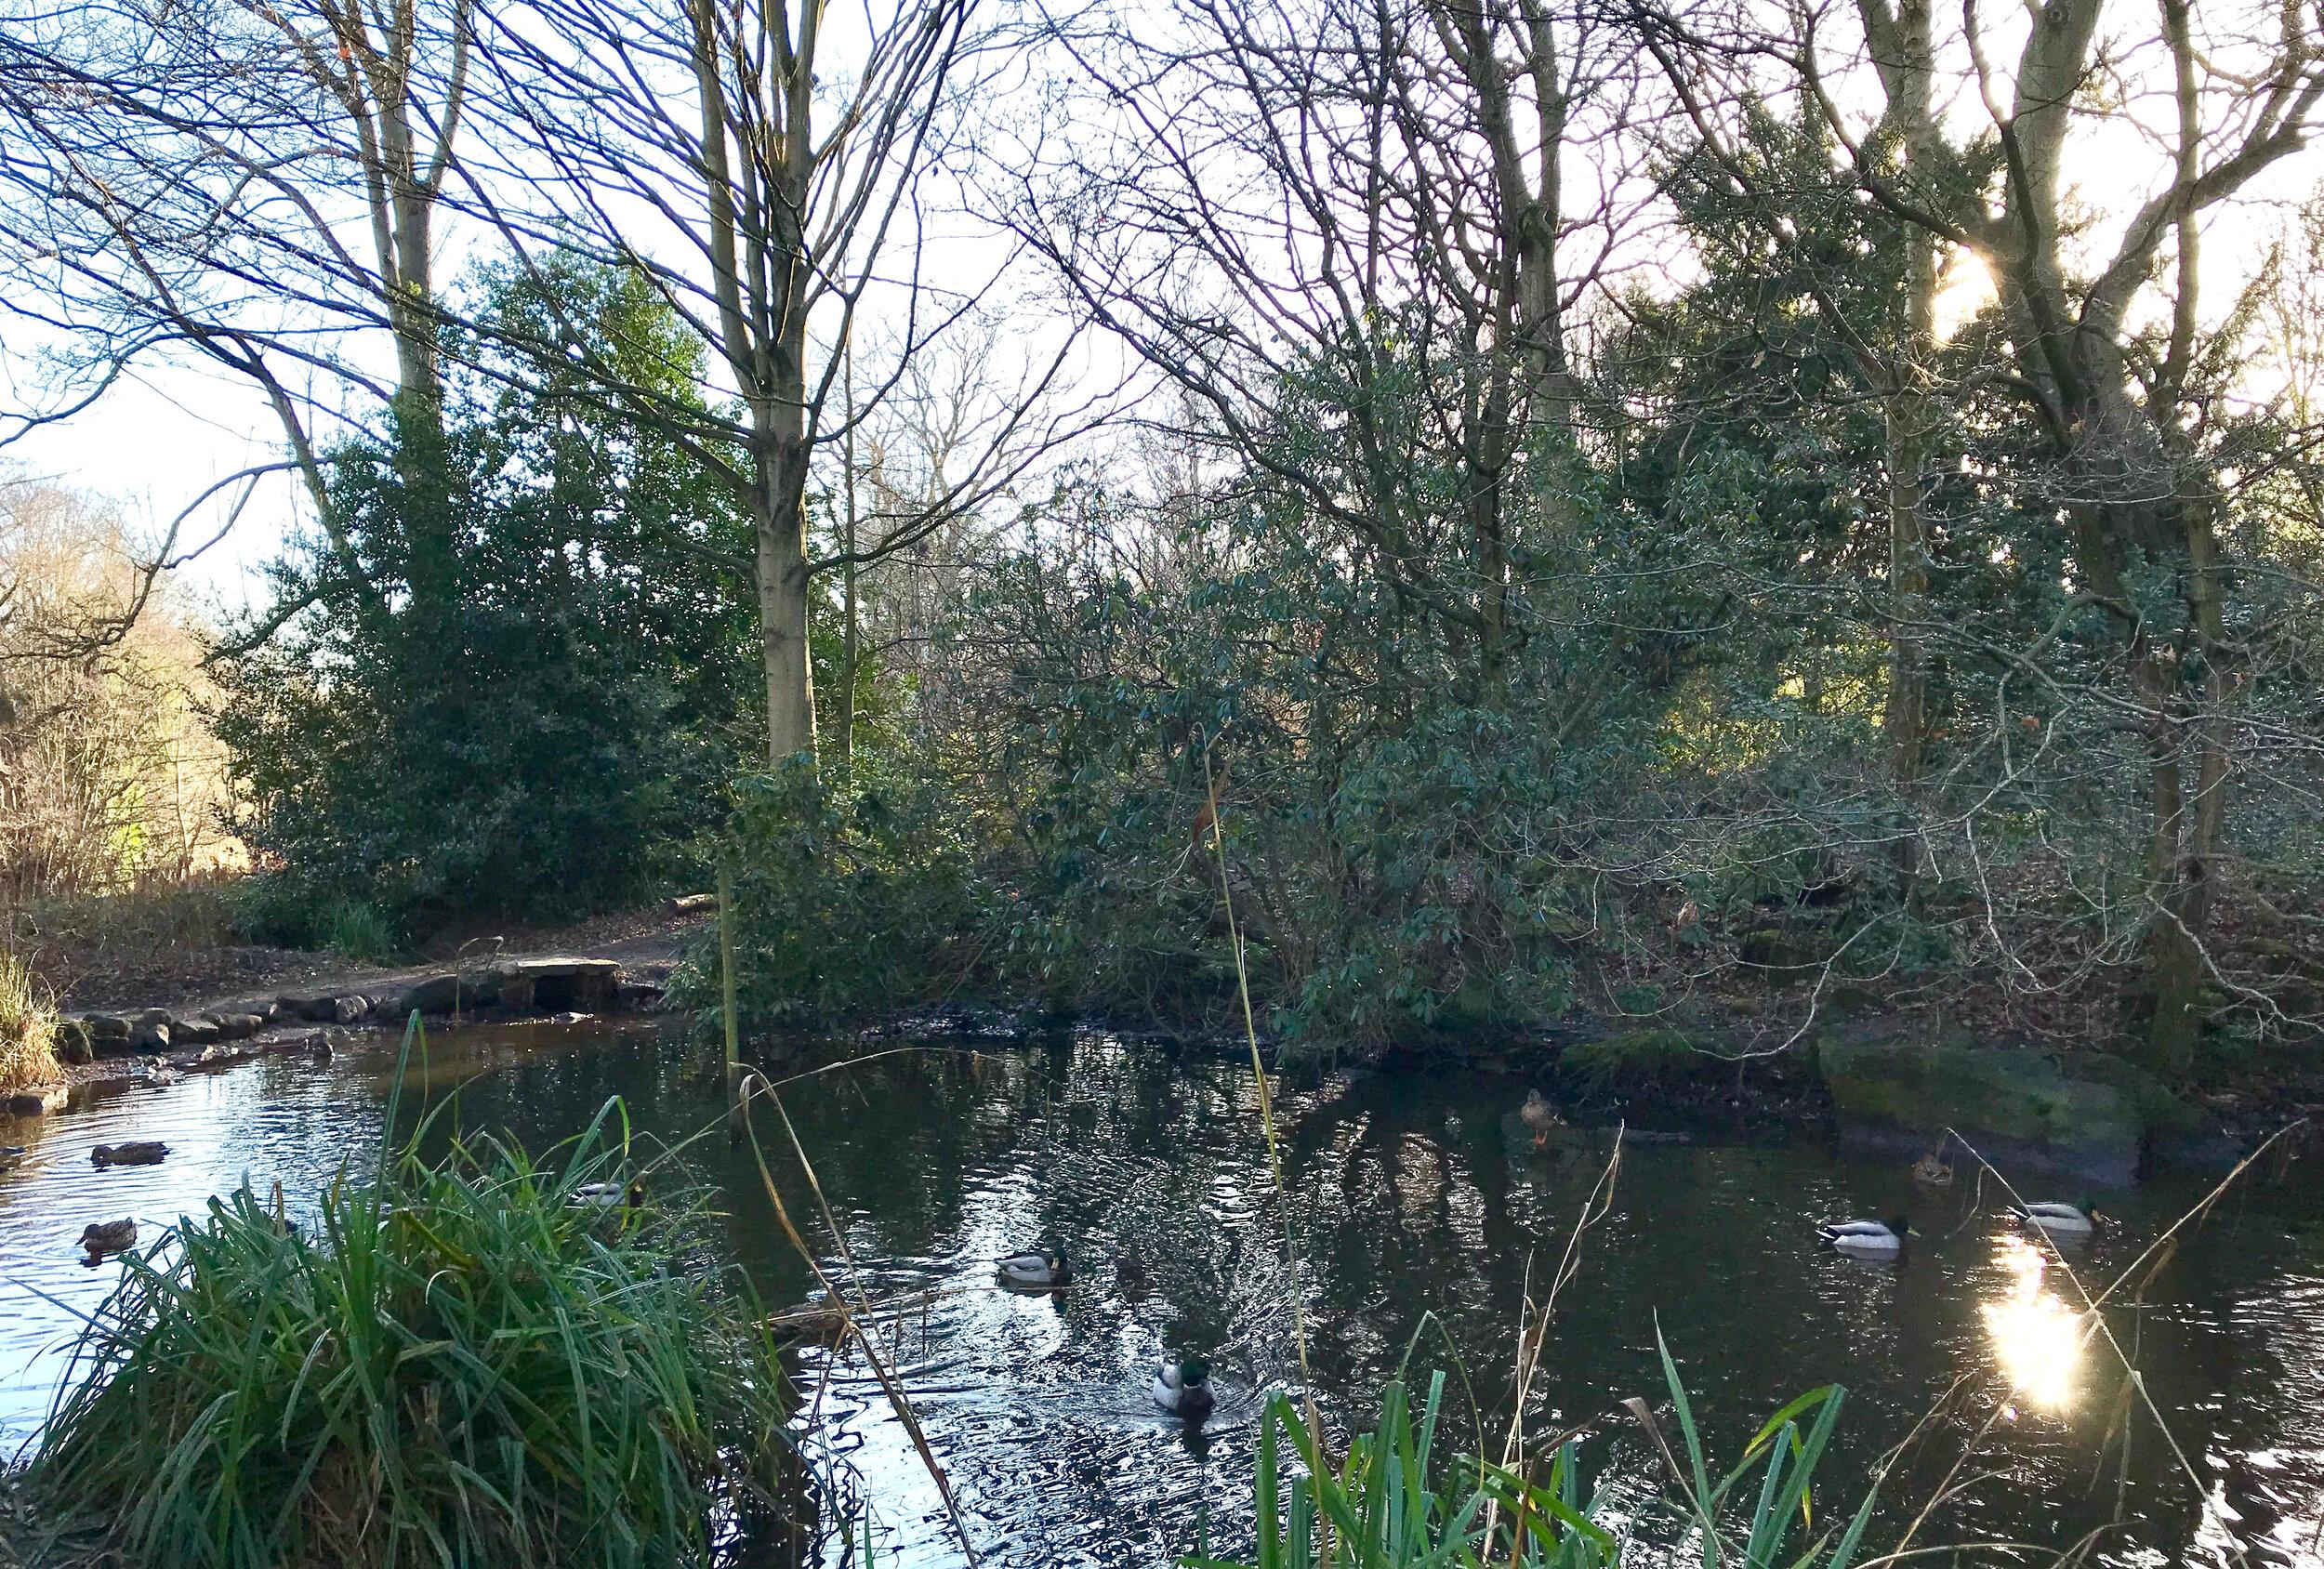 Henry's Pond, Meanwood Park © HP